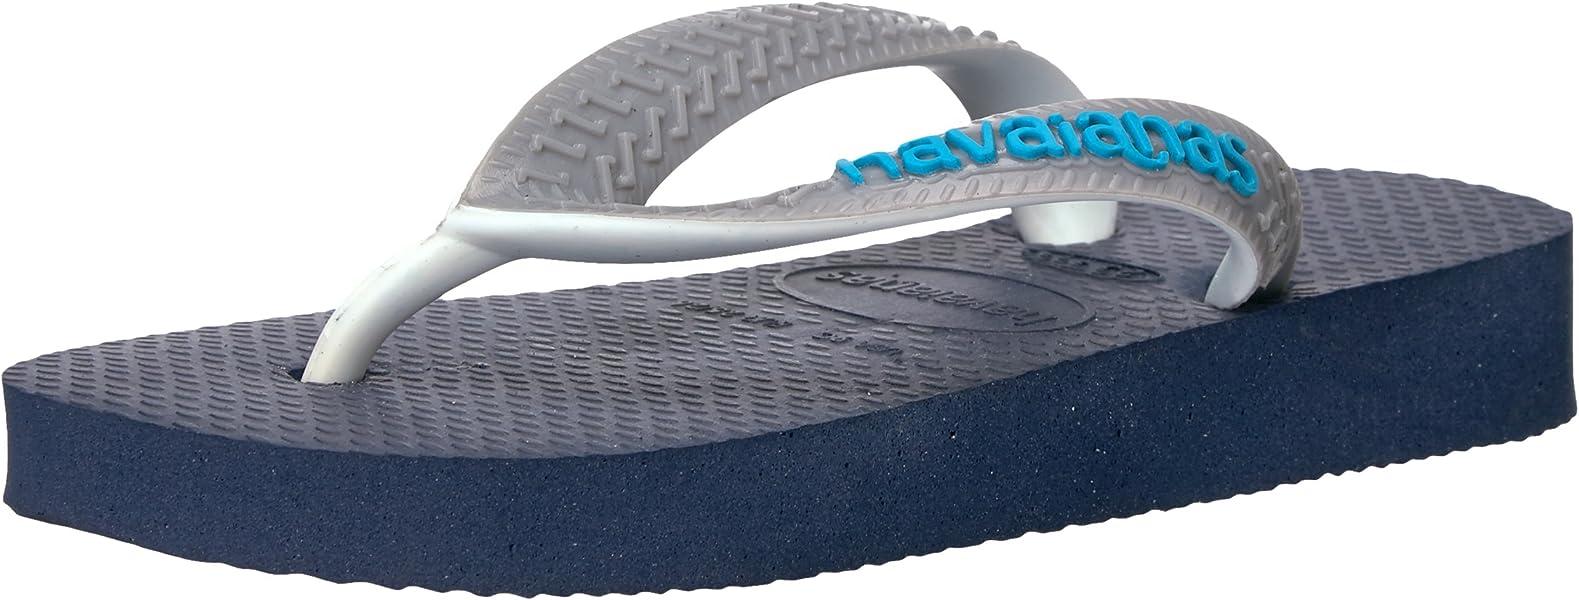 e0f7bee7b8ef Havaianas Kids  Top Mix Sandal Navy Blue Steel Grey Flip Flop